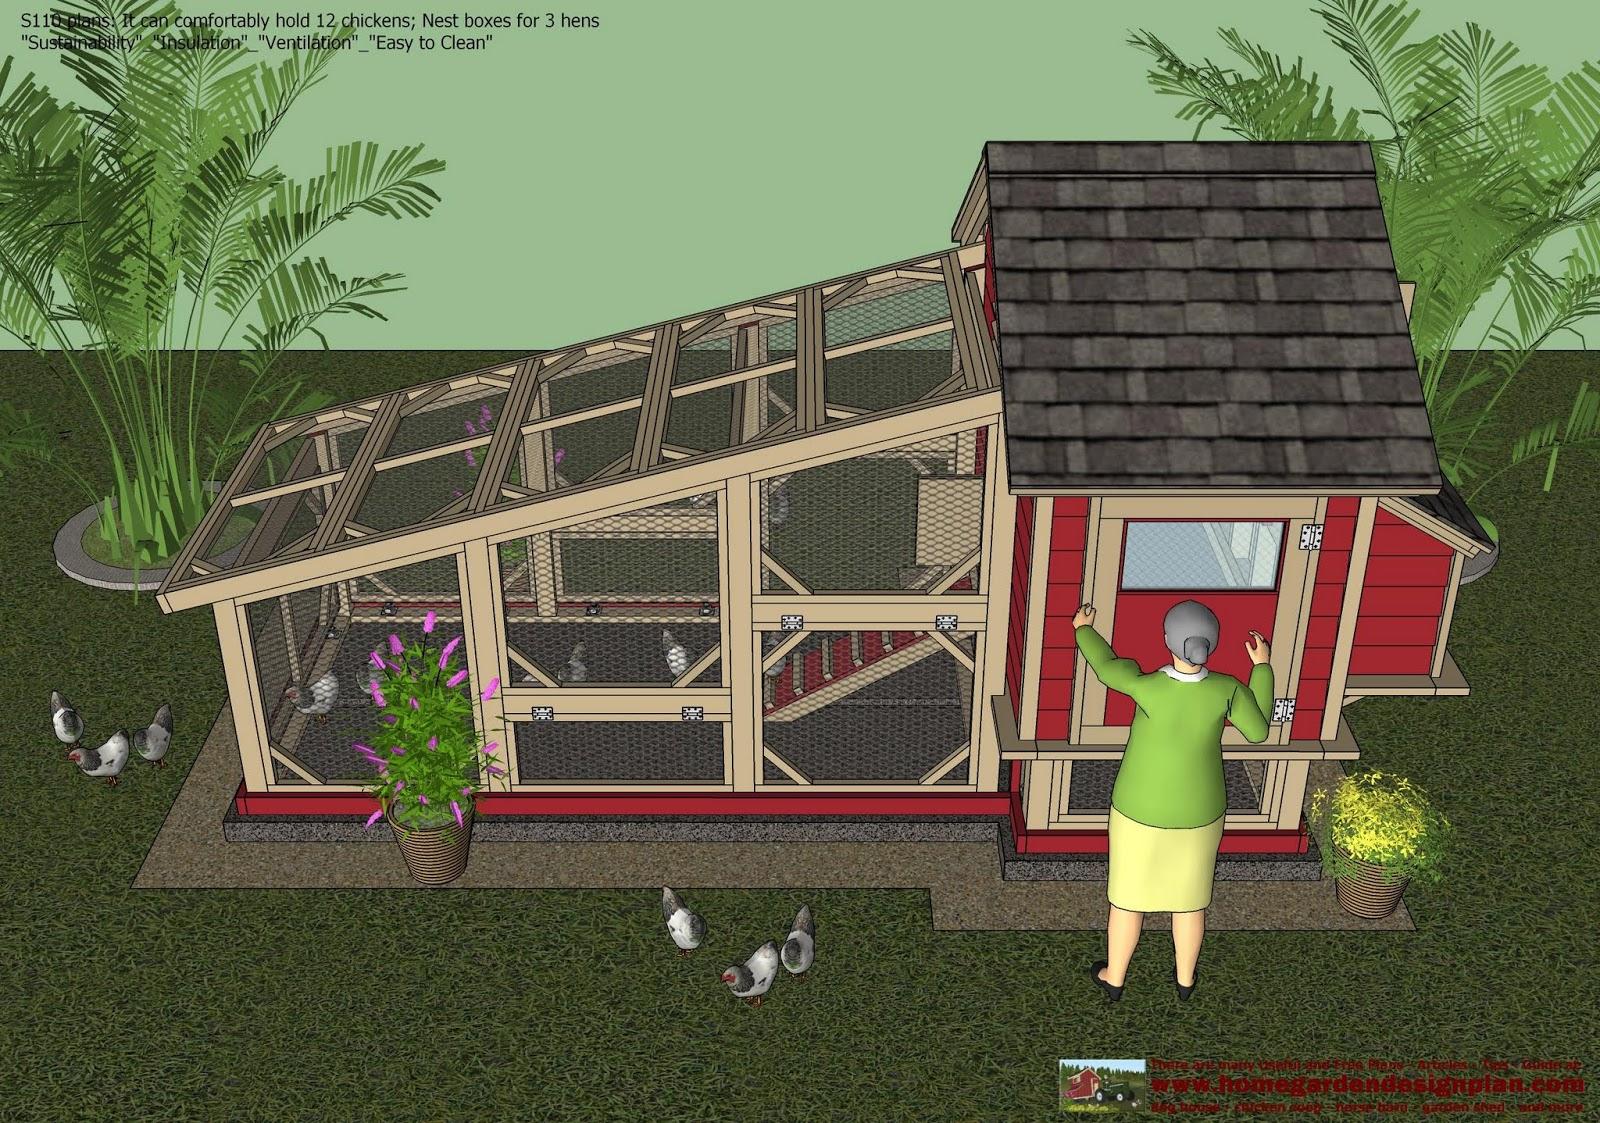 minecraft how to build a chicken coop